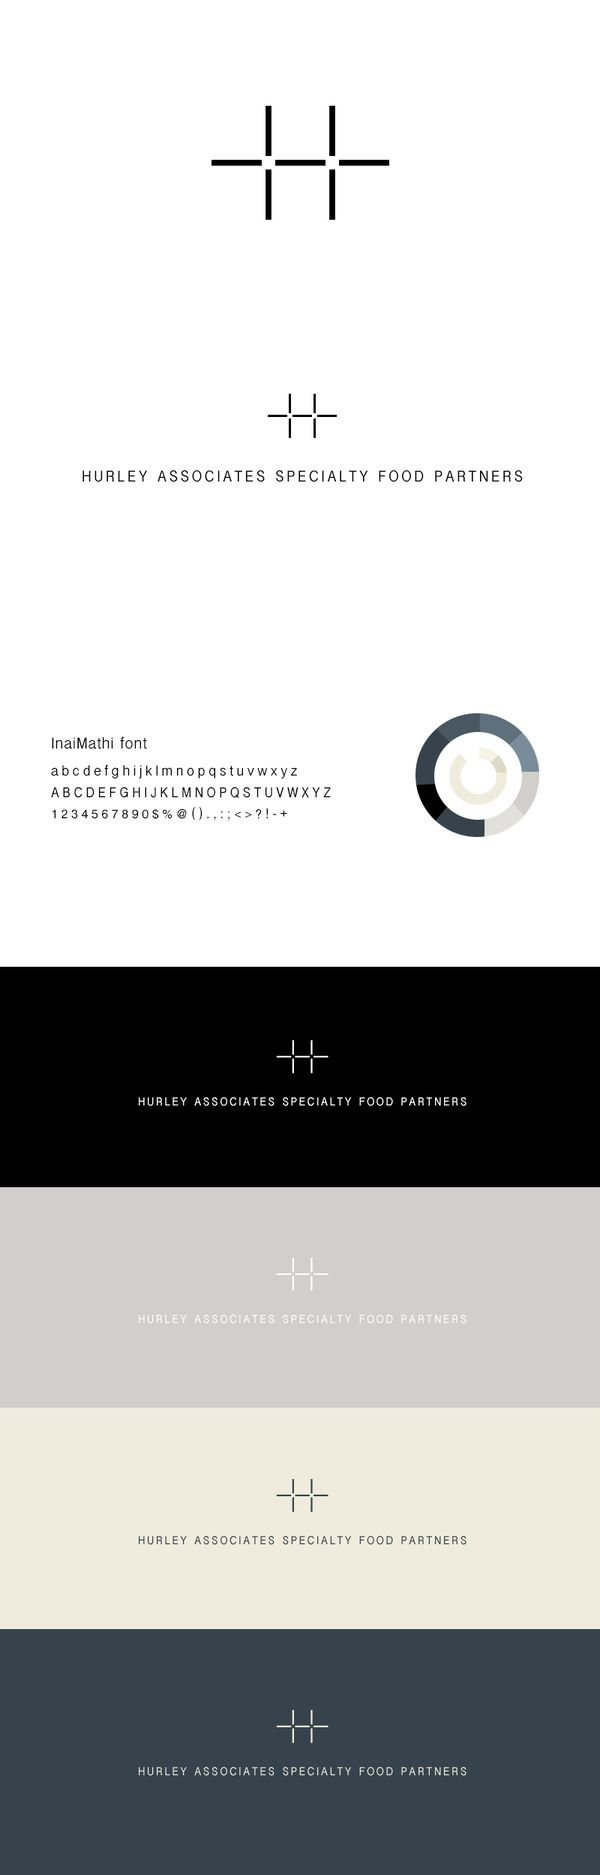 Modern, Smart + Versatile - #branding #identity   H . A . S . F . P by Tamara…